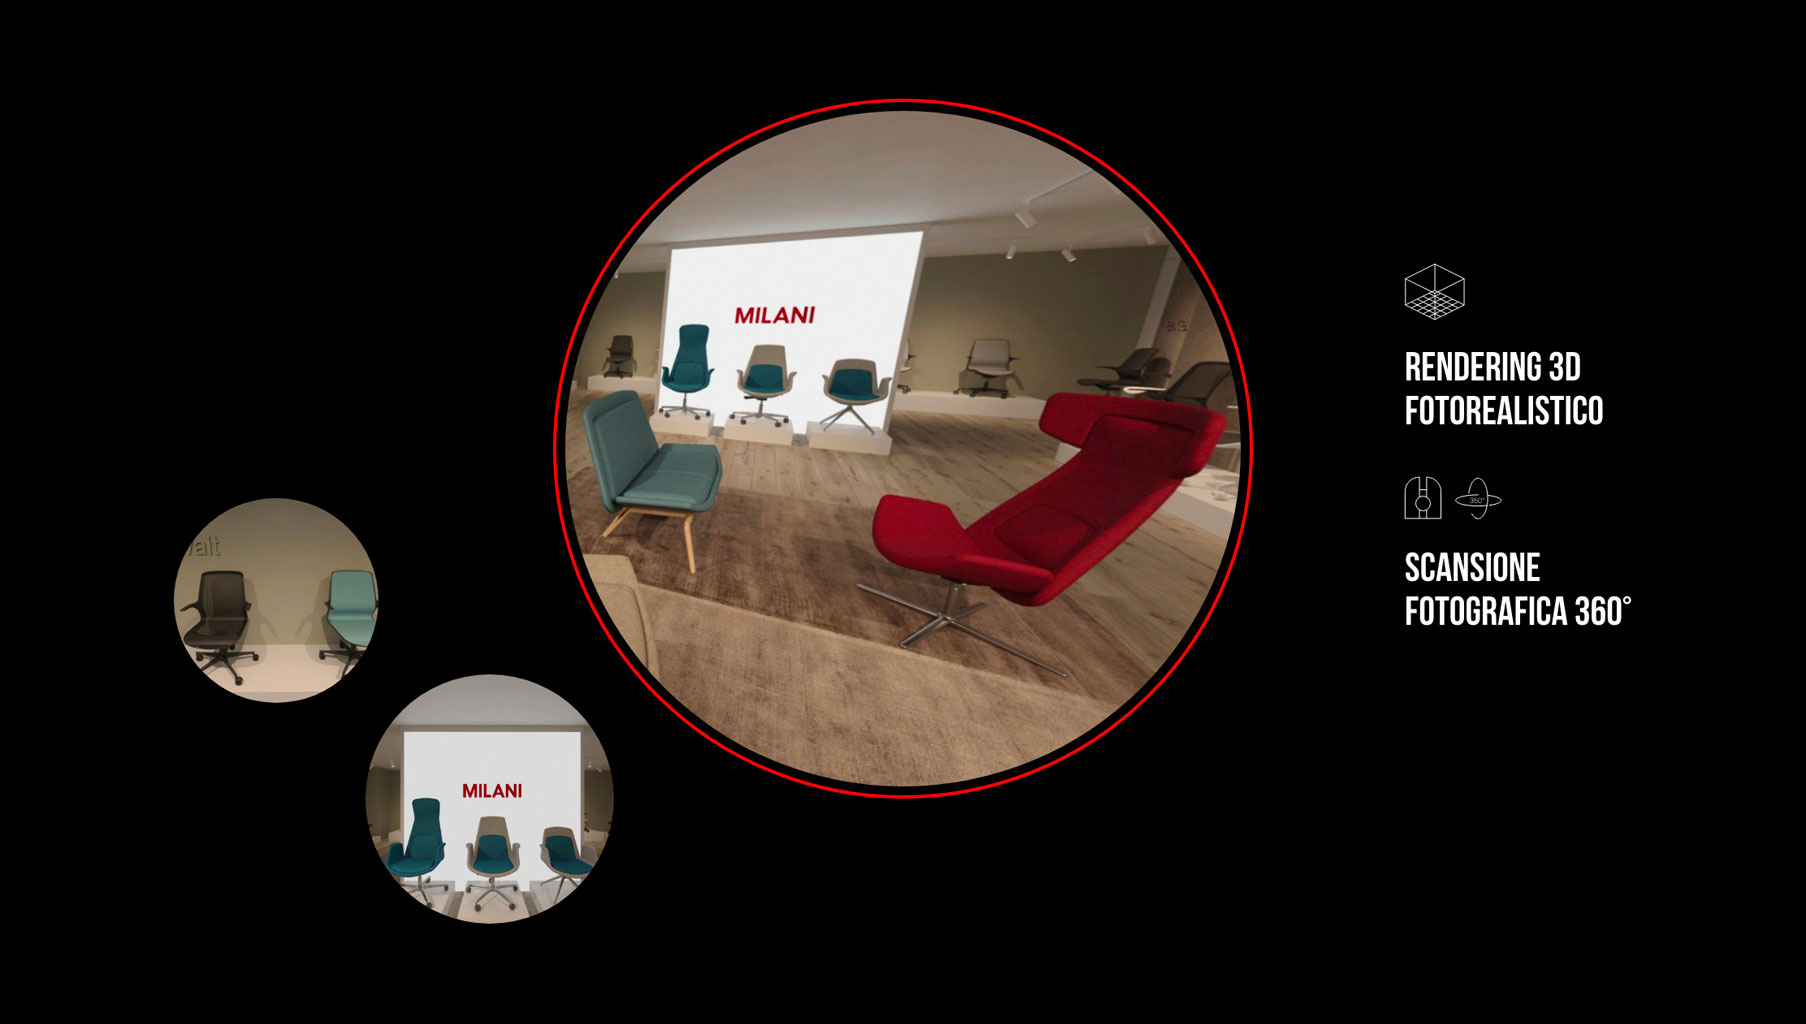 Realtà virtuale fotorealistica di alta qualità